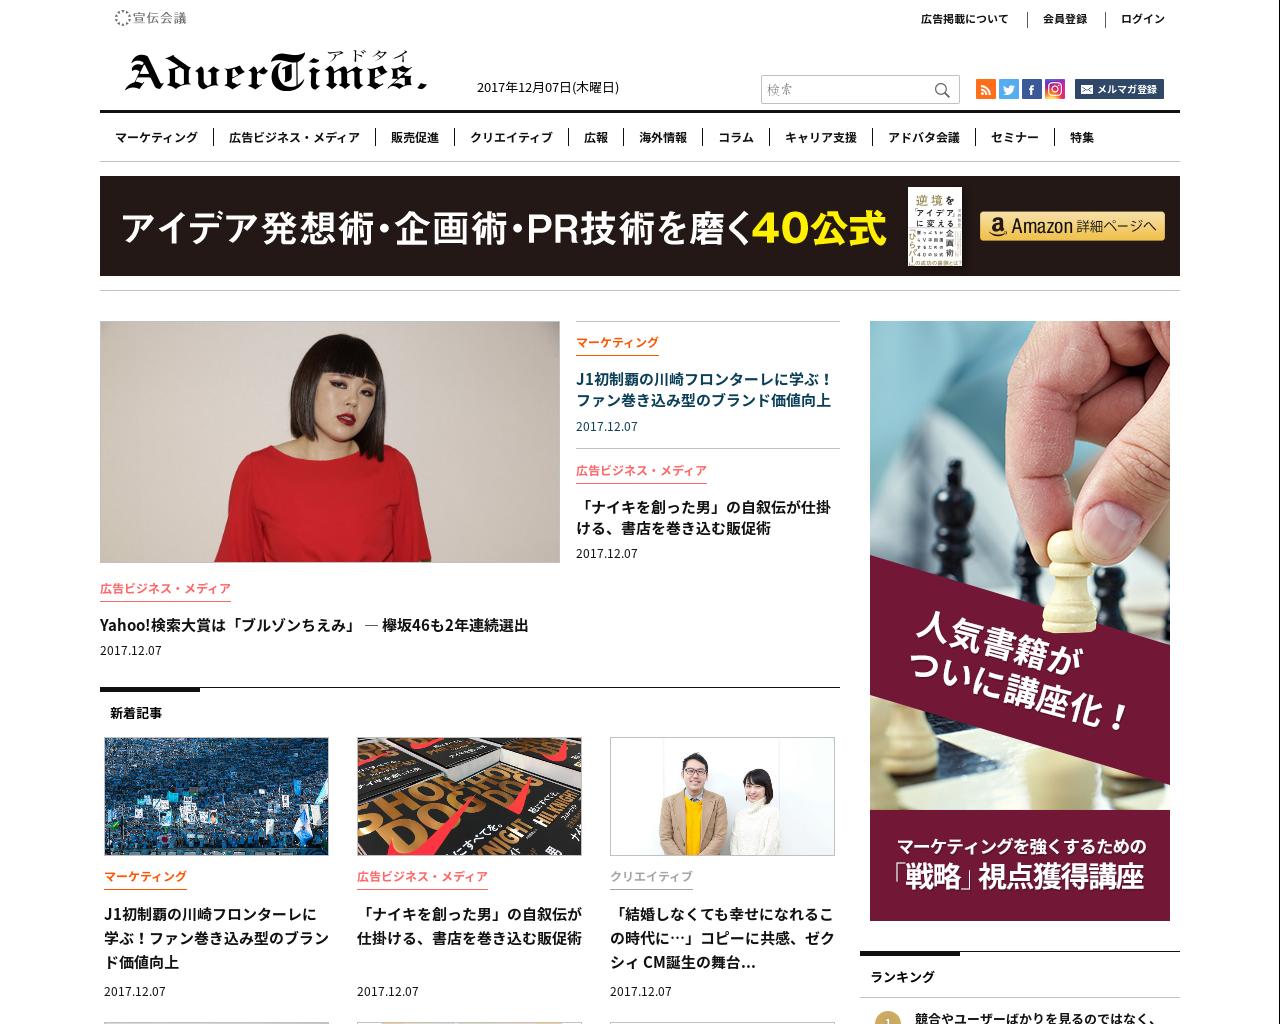 www.advertimes.com(2017/12/05 07:00:31)